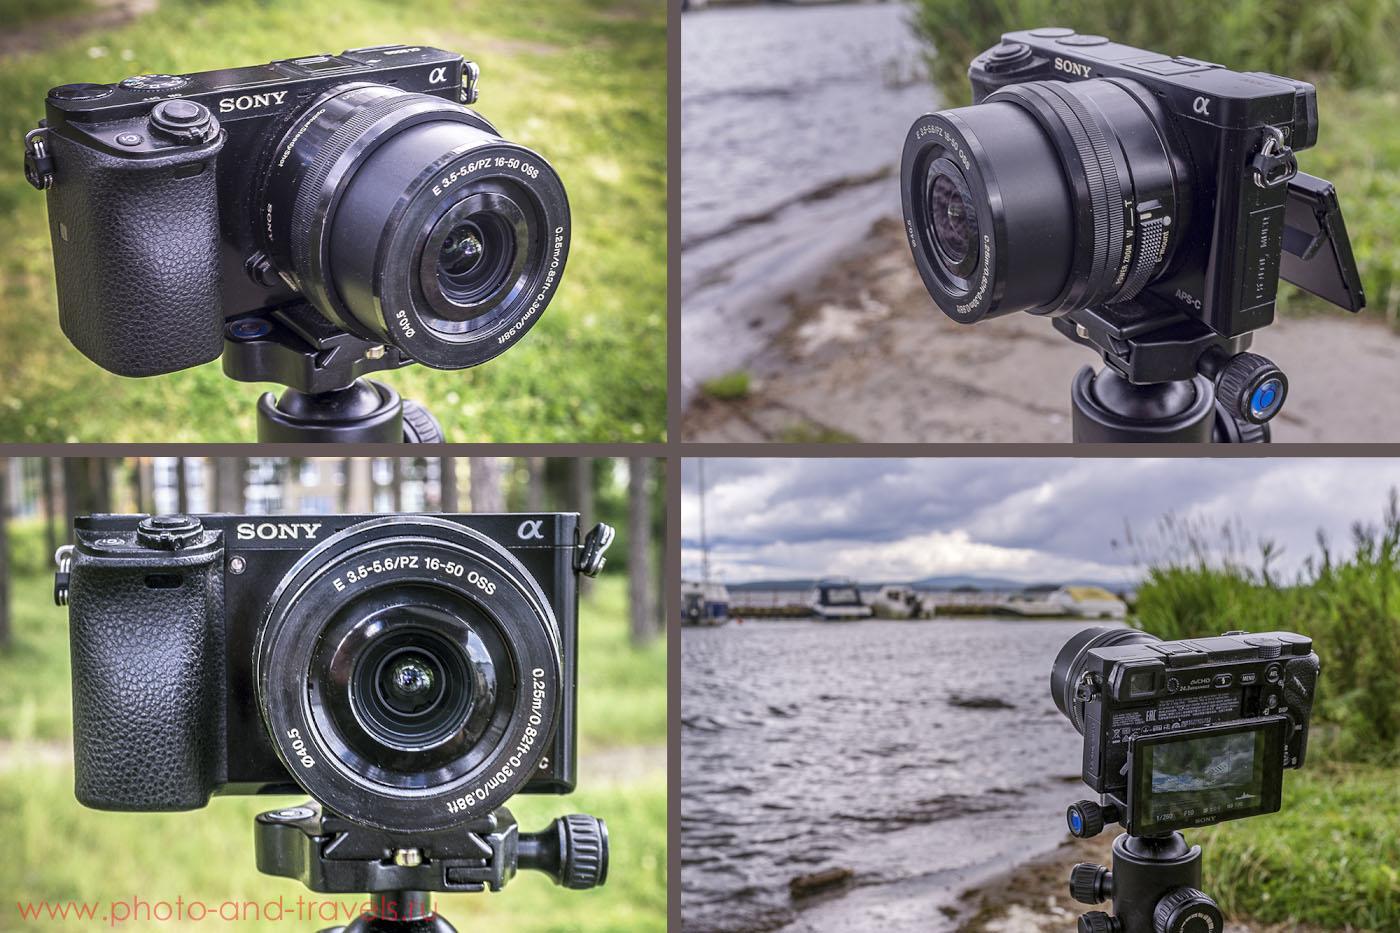 Фотография 1. Беззеркальная цифровая камера Sony A6000 KIT 16-50mm f/3.5-5.6.